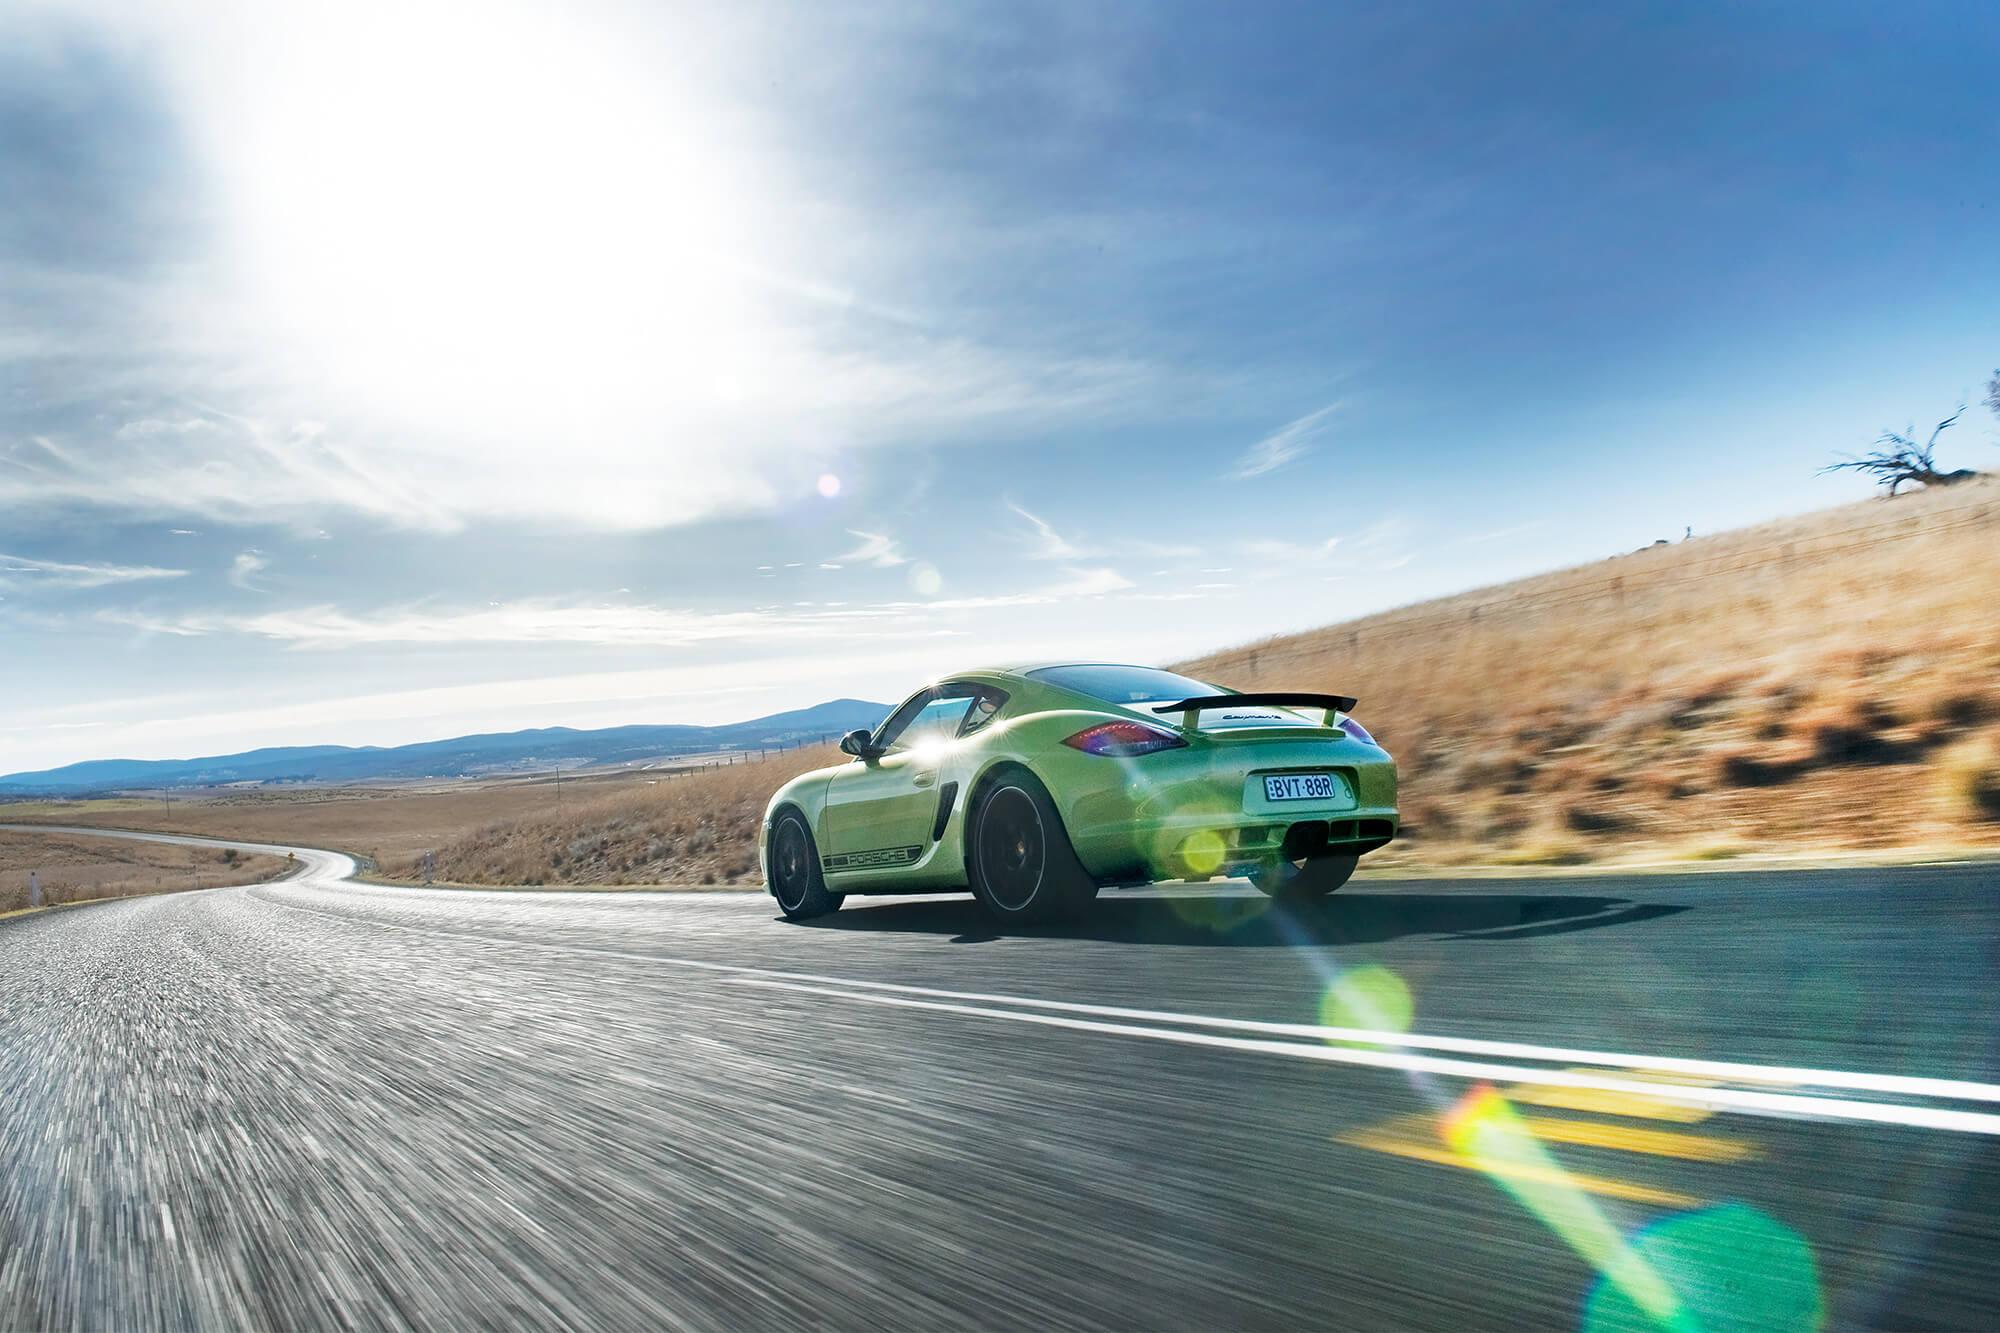 Client: Top Gear Australia